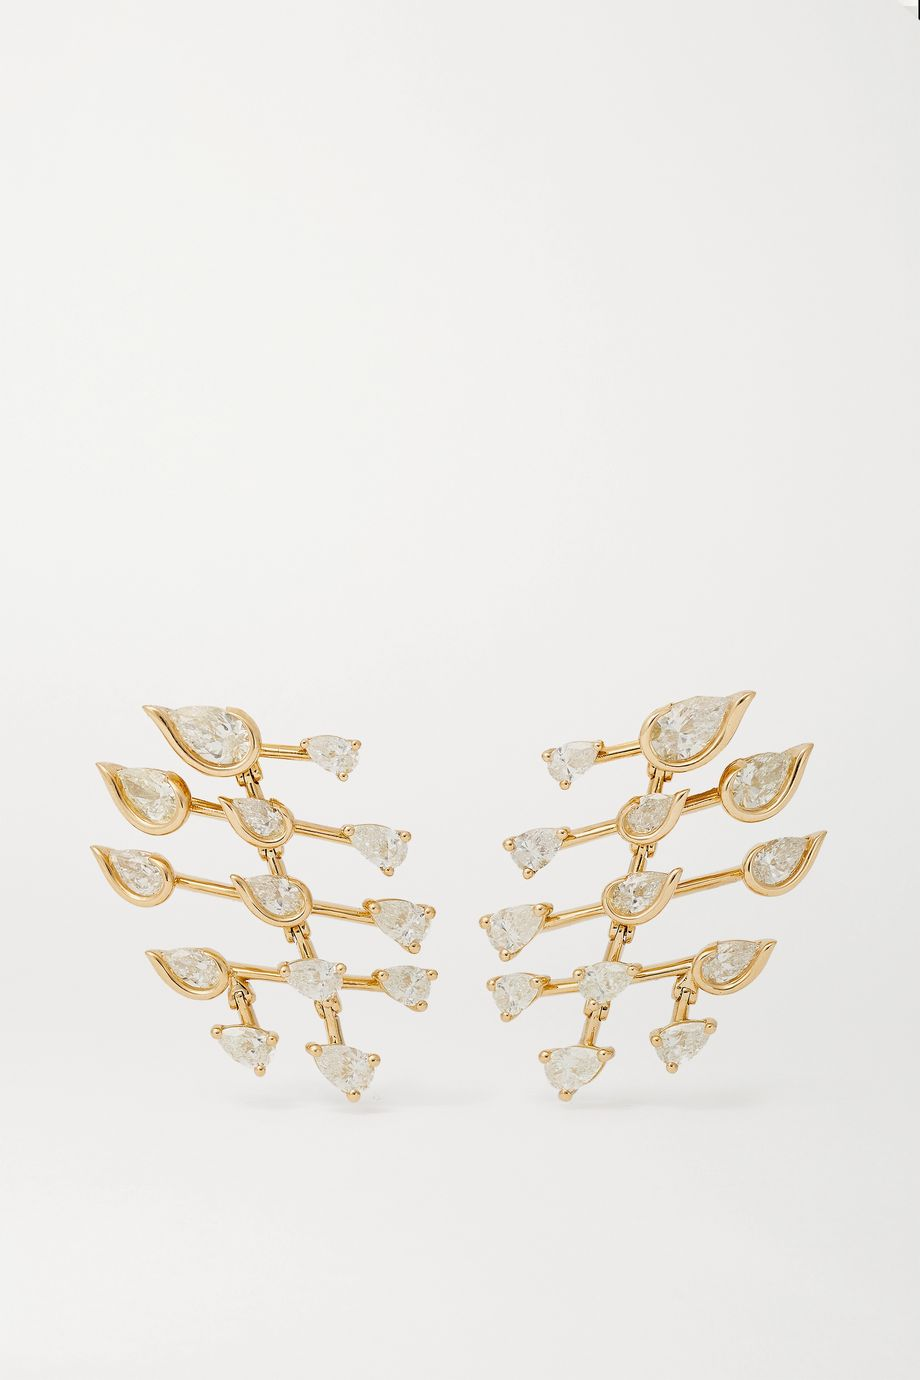 Fernando Jorge Flare Small 18-karat gold diamond earrings